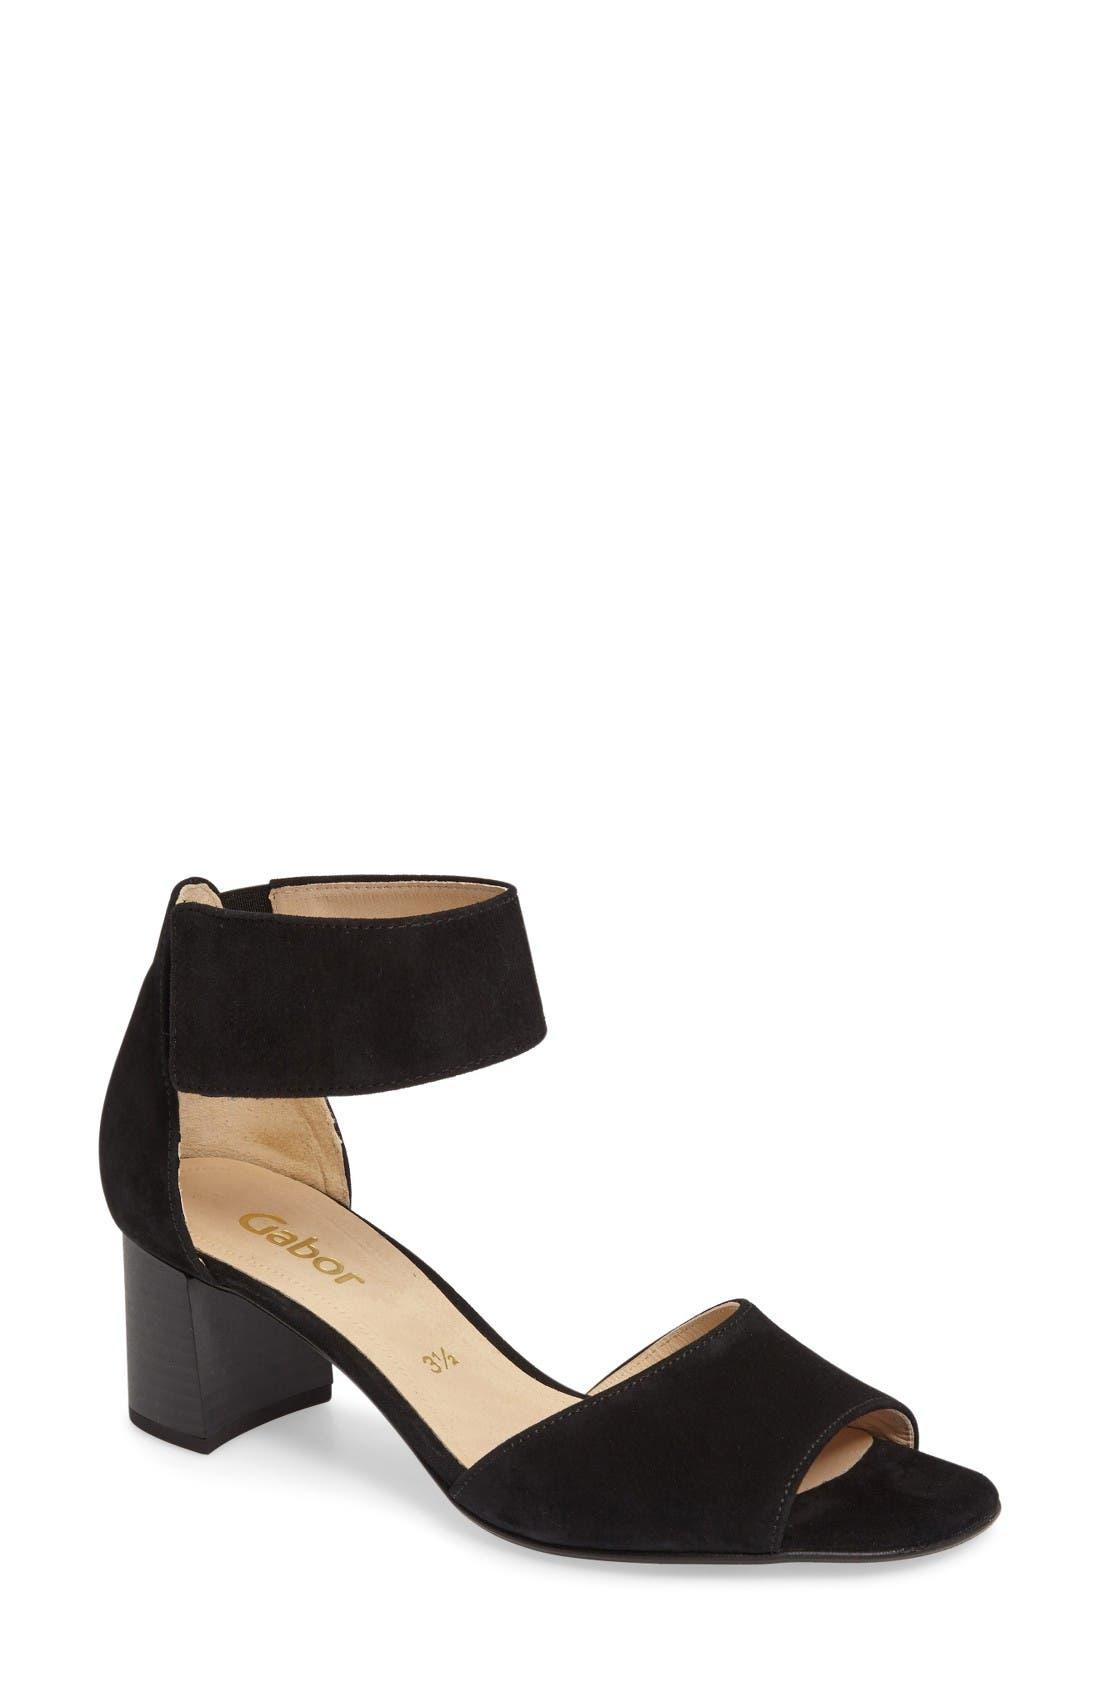 GABOR Ankle Strap Sandal